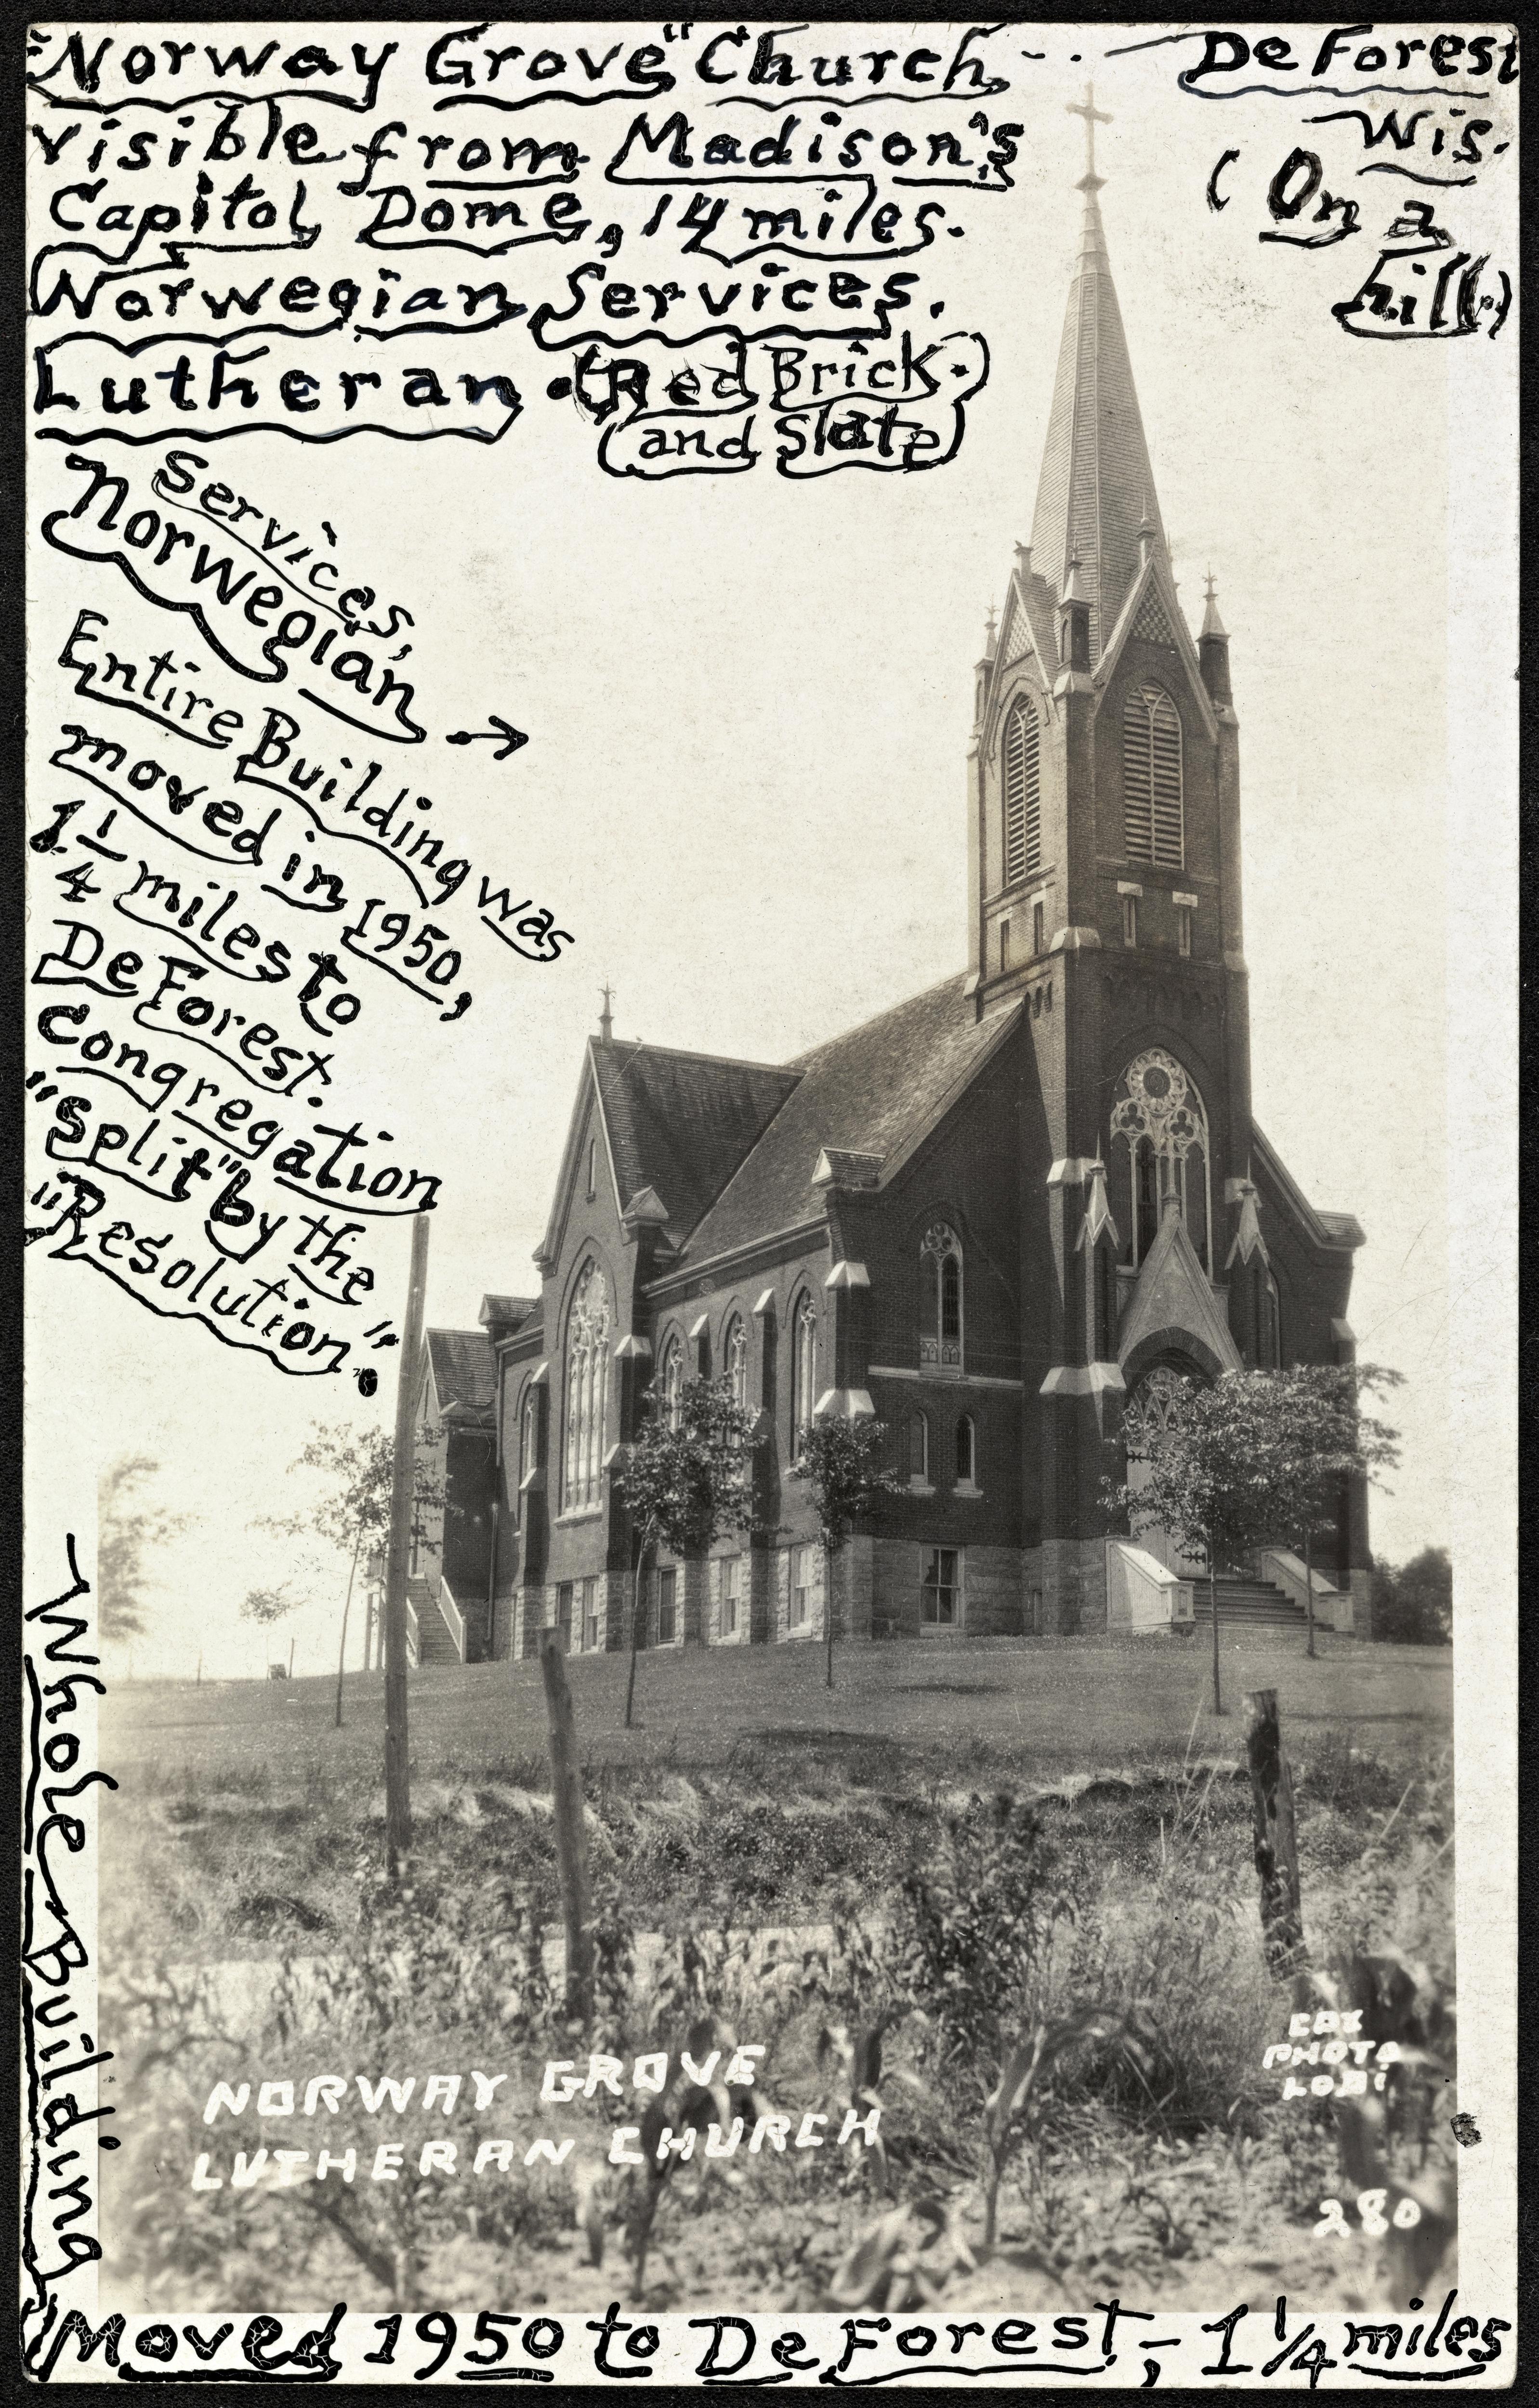 280. Norway Grove Lutheran Church